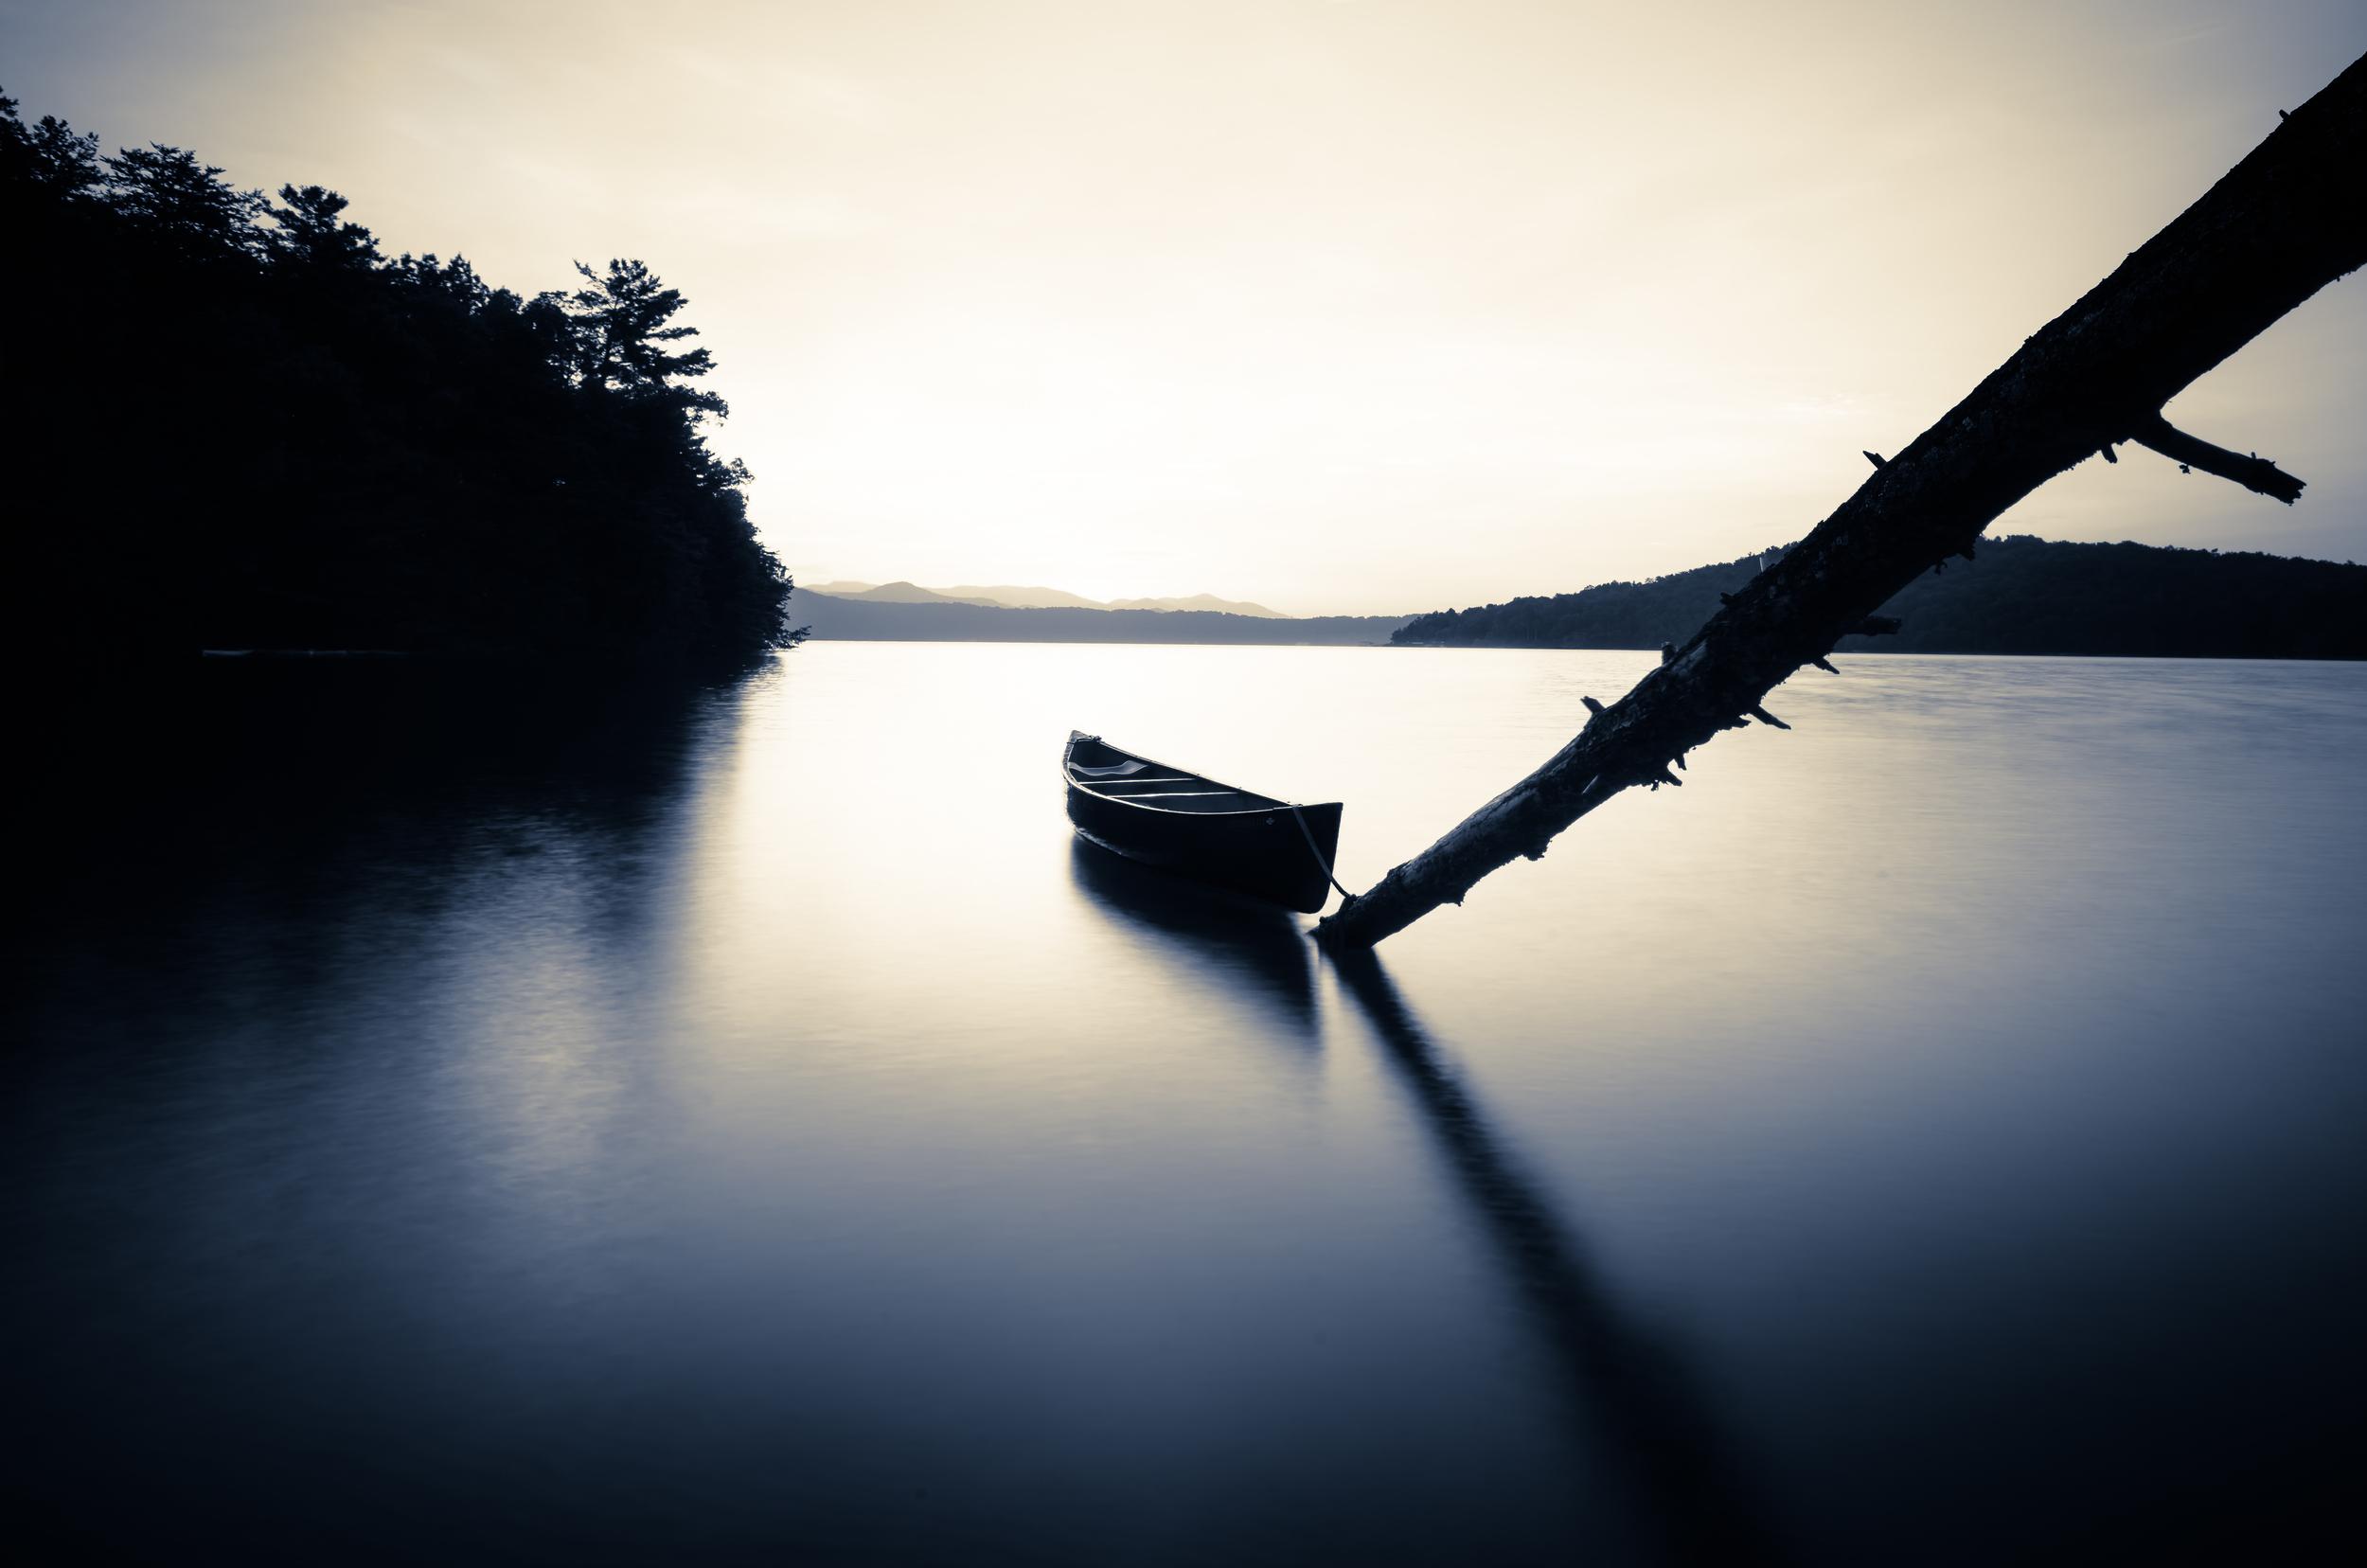 CanoeDock-1003.jpg